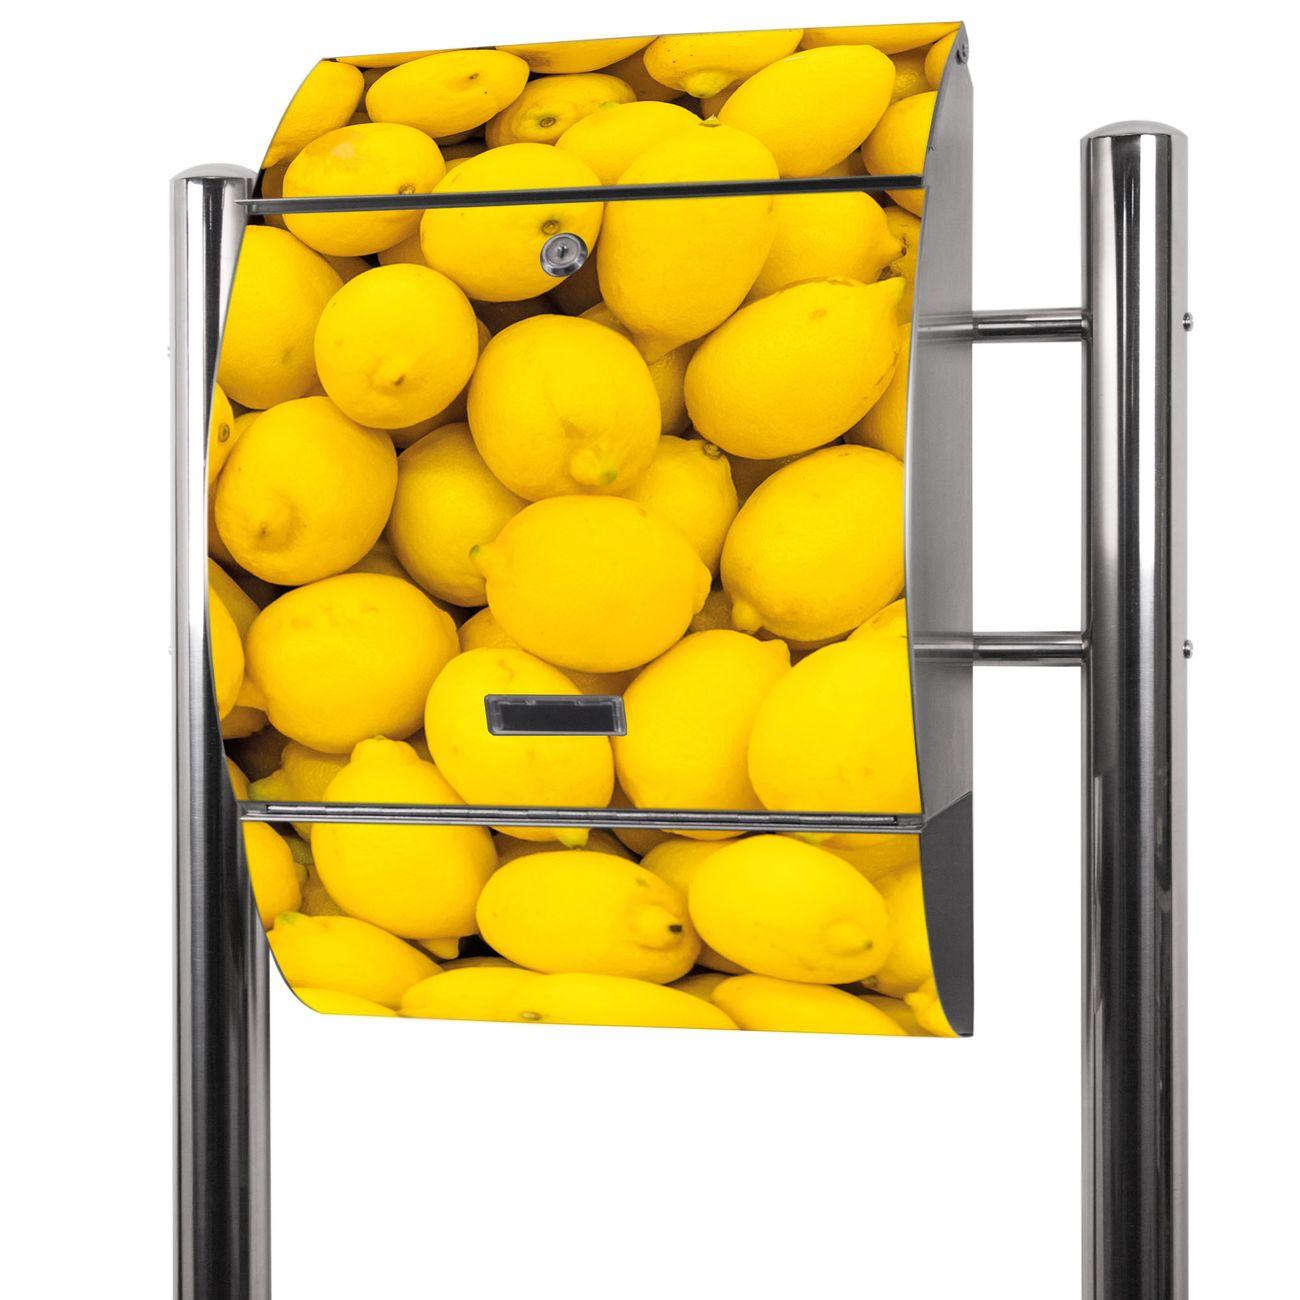 Edelstahl Standbriefkasten Zitronen